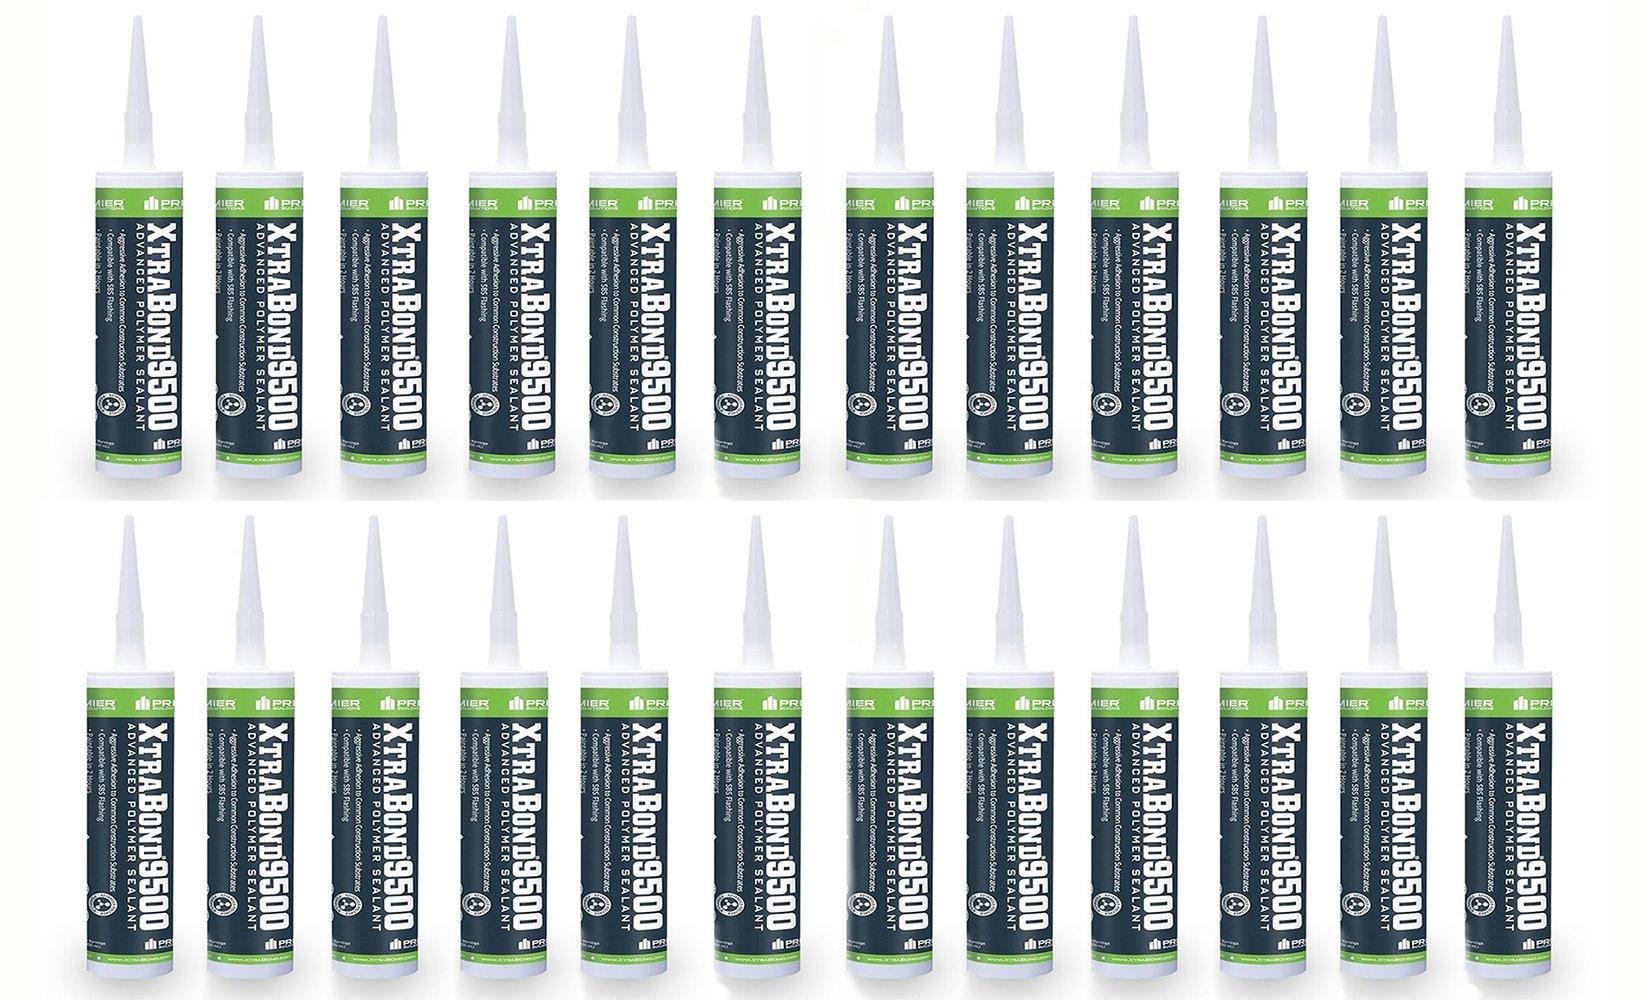 Pack of 24 - Premier Xtrabond 9500 Advanced Polymer Sealant (aluminum stone)